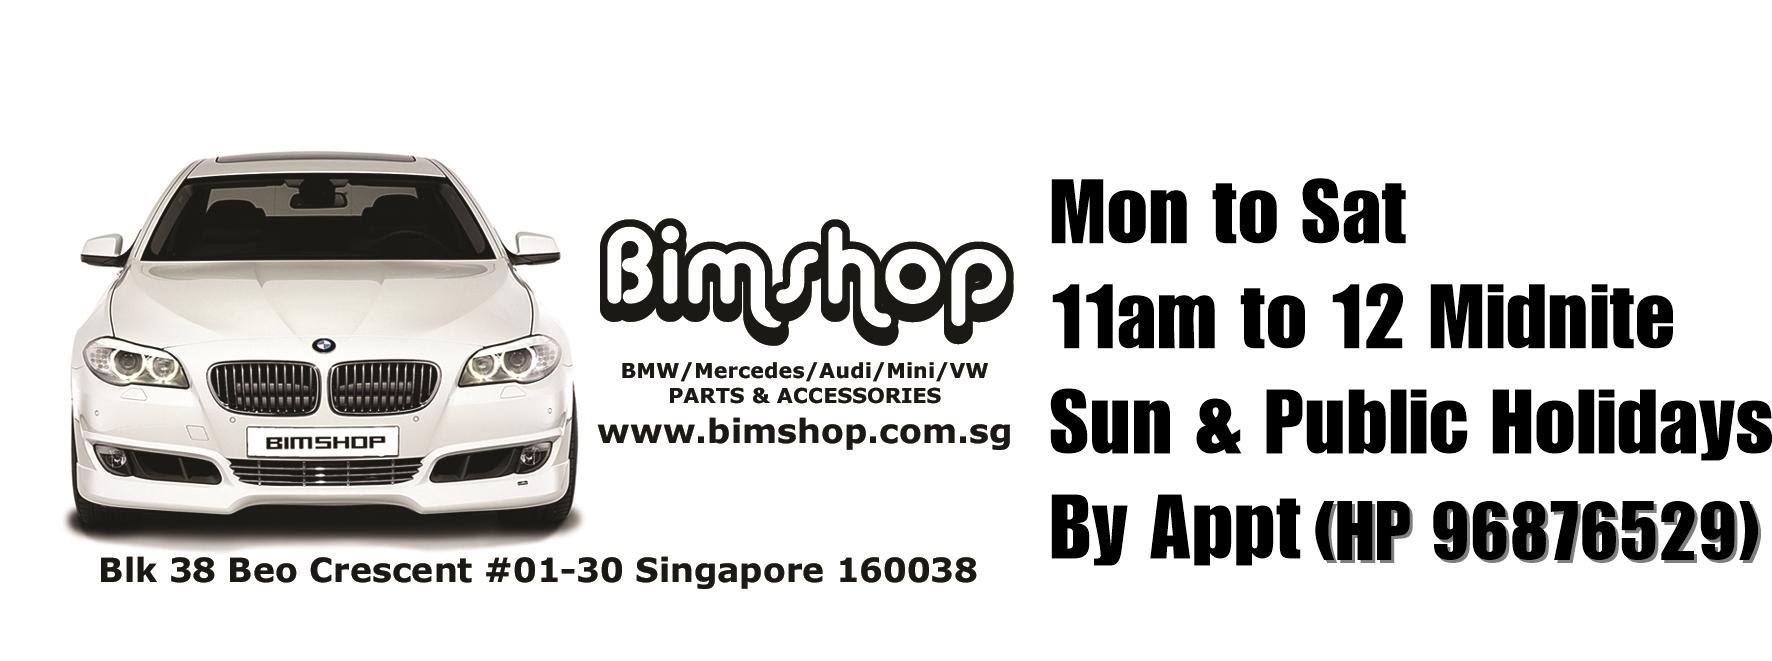 bimshop_banner_timing.jpg?m=1520698153